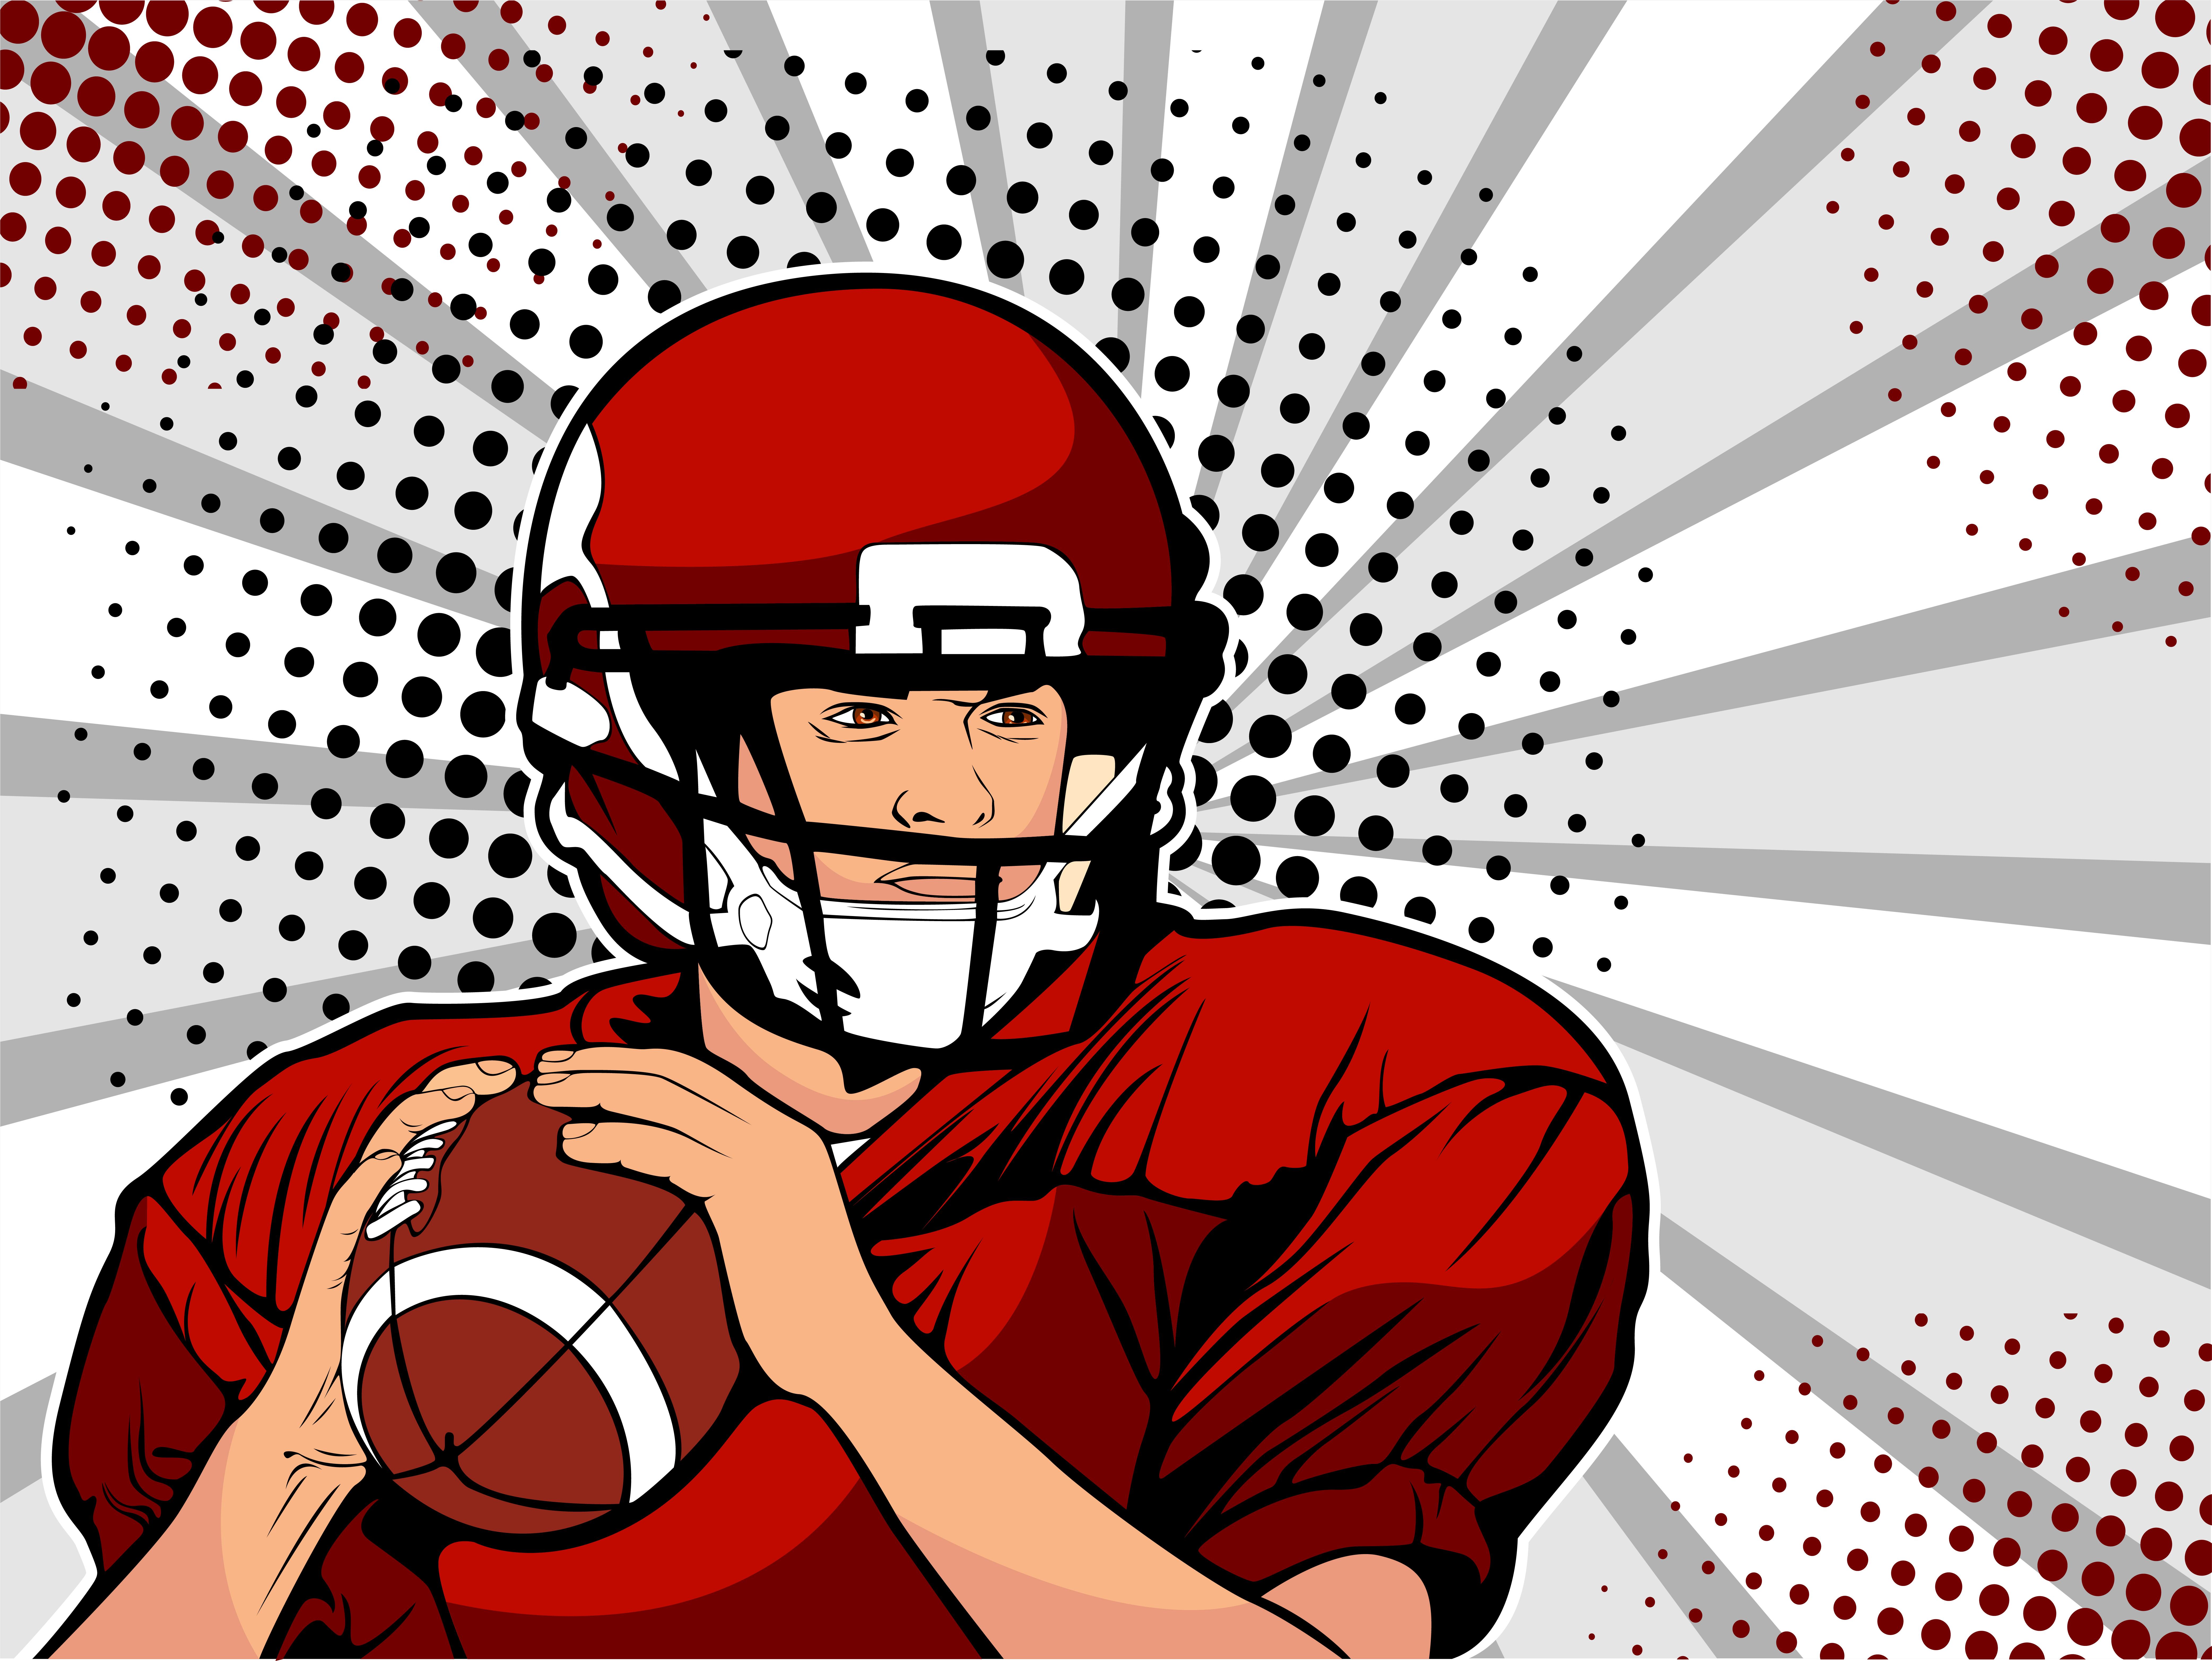 American Football Player Quarterback Download Free